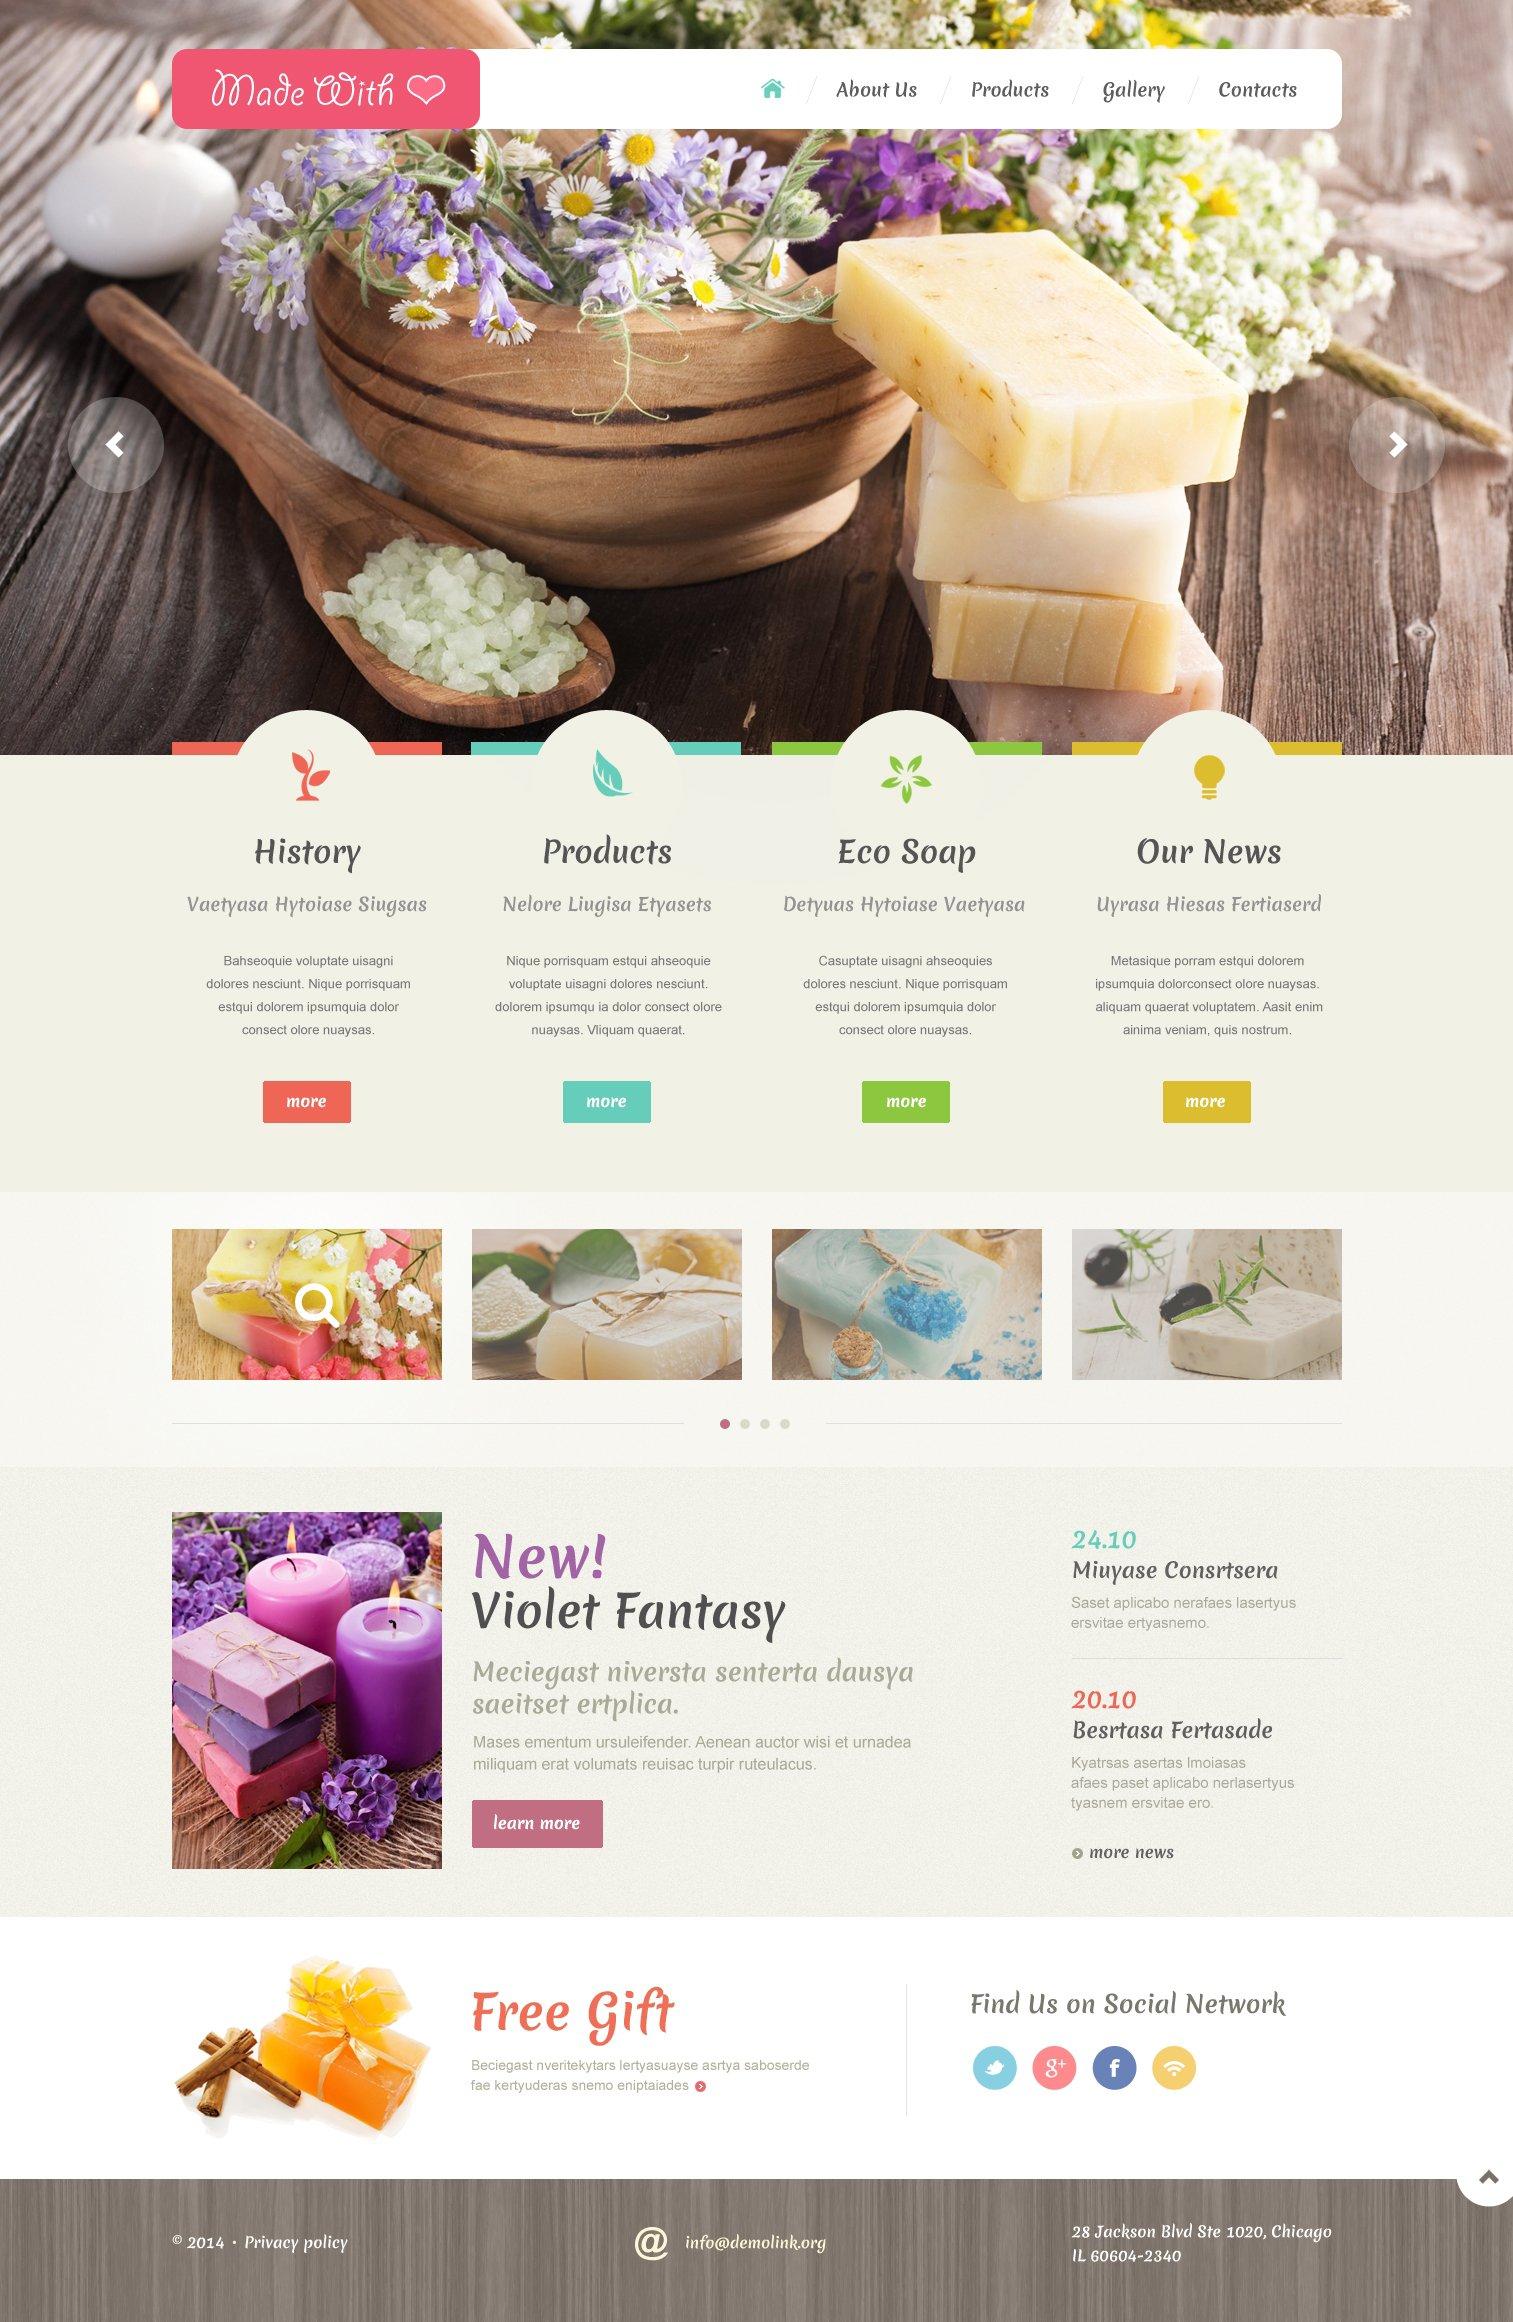 Modèle Web adaptatif pour magasin artisanal #48988 - screenshot